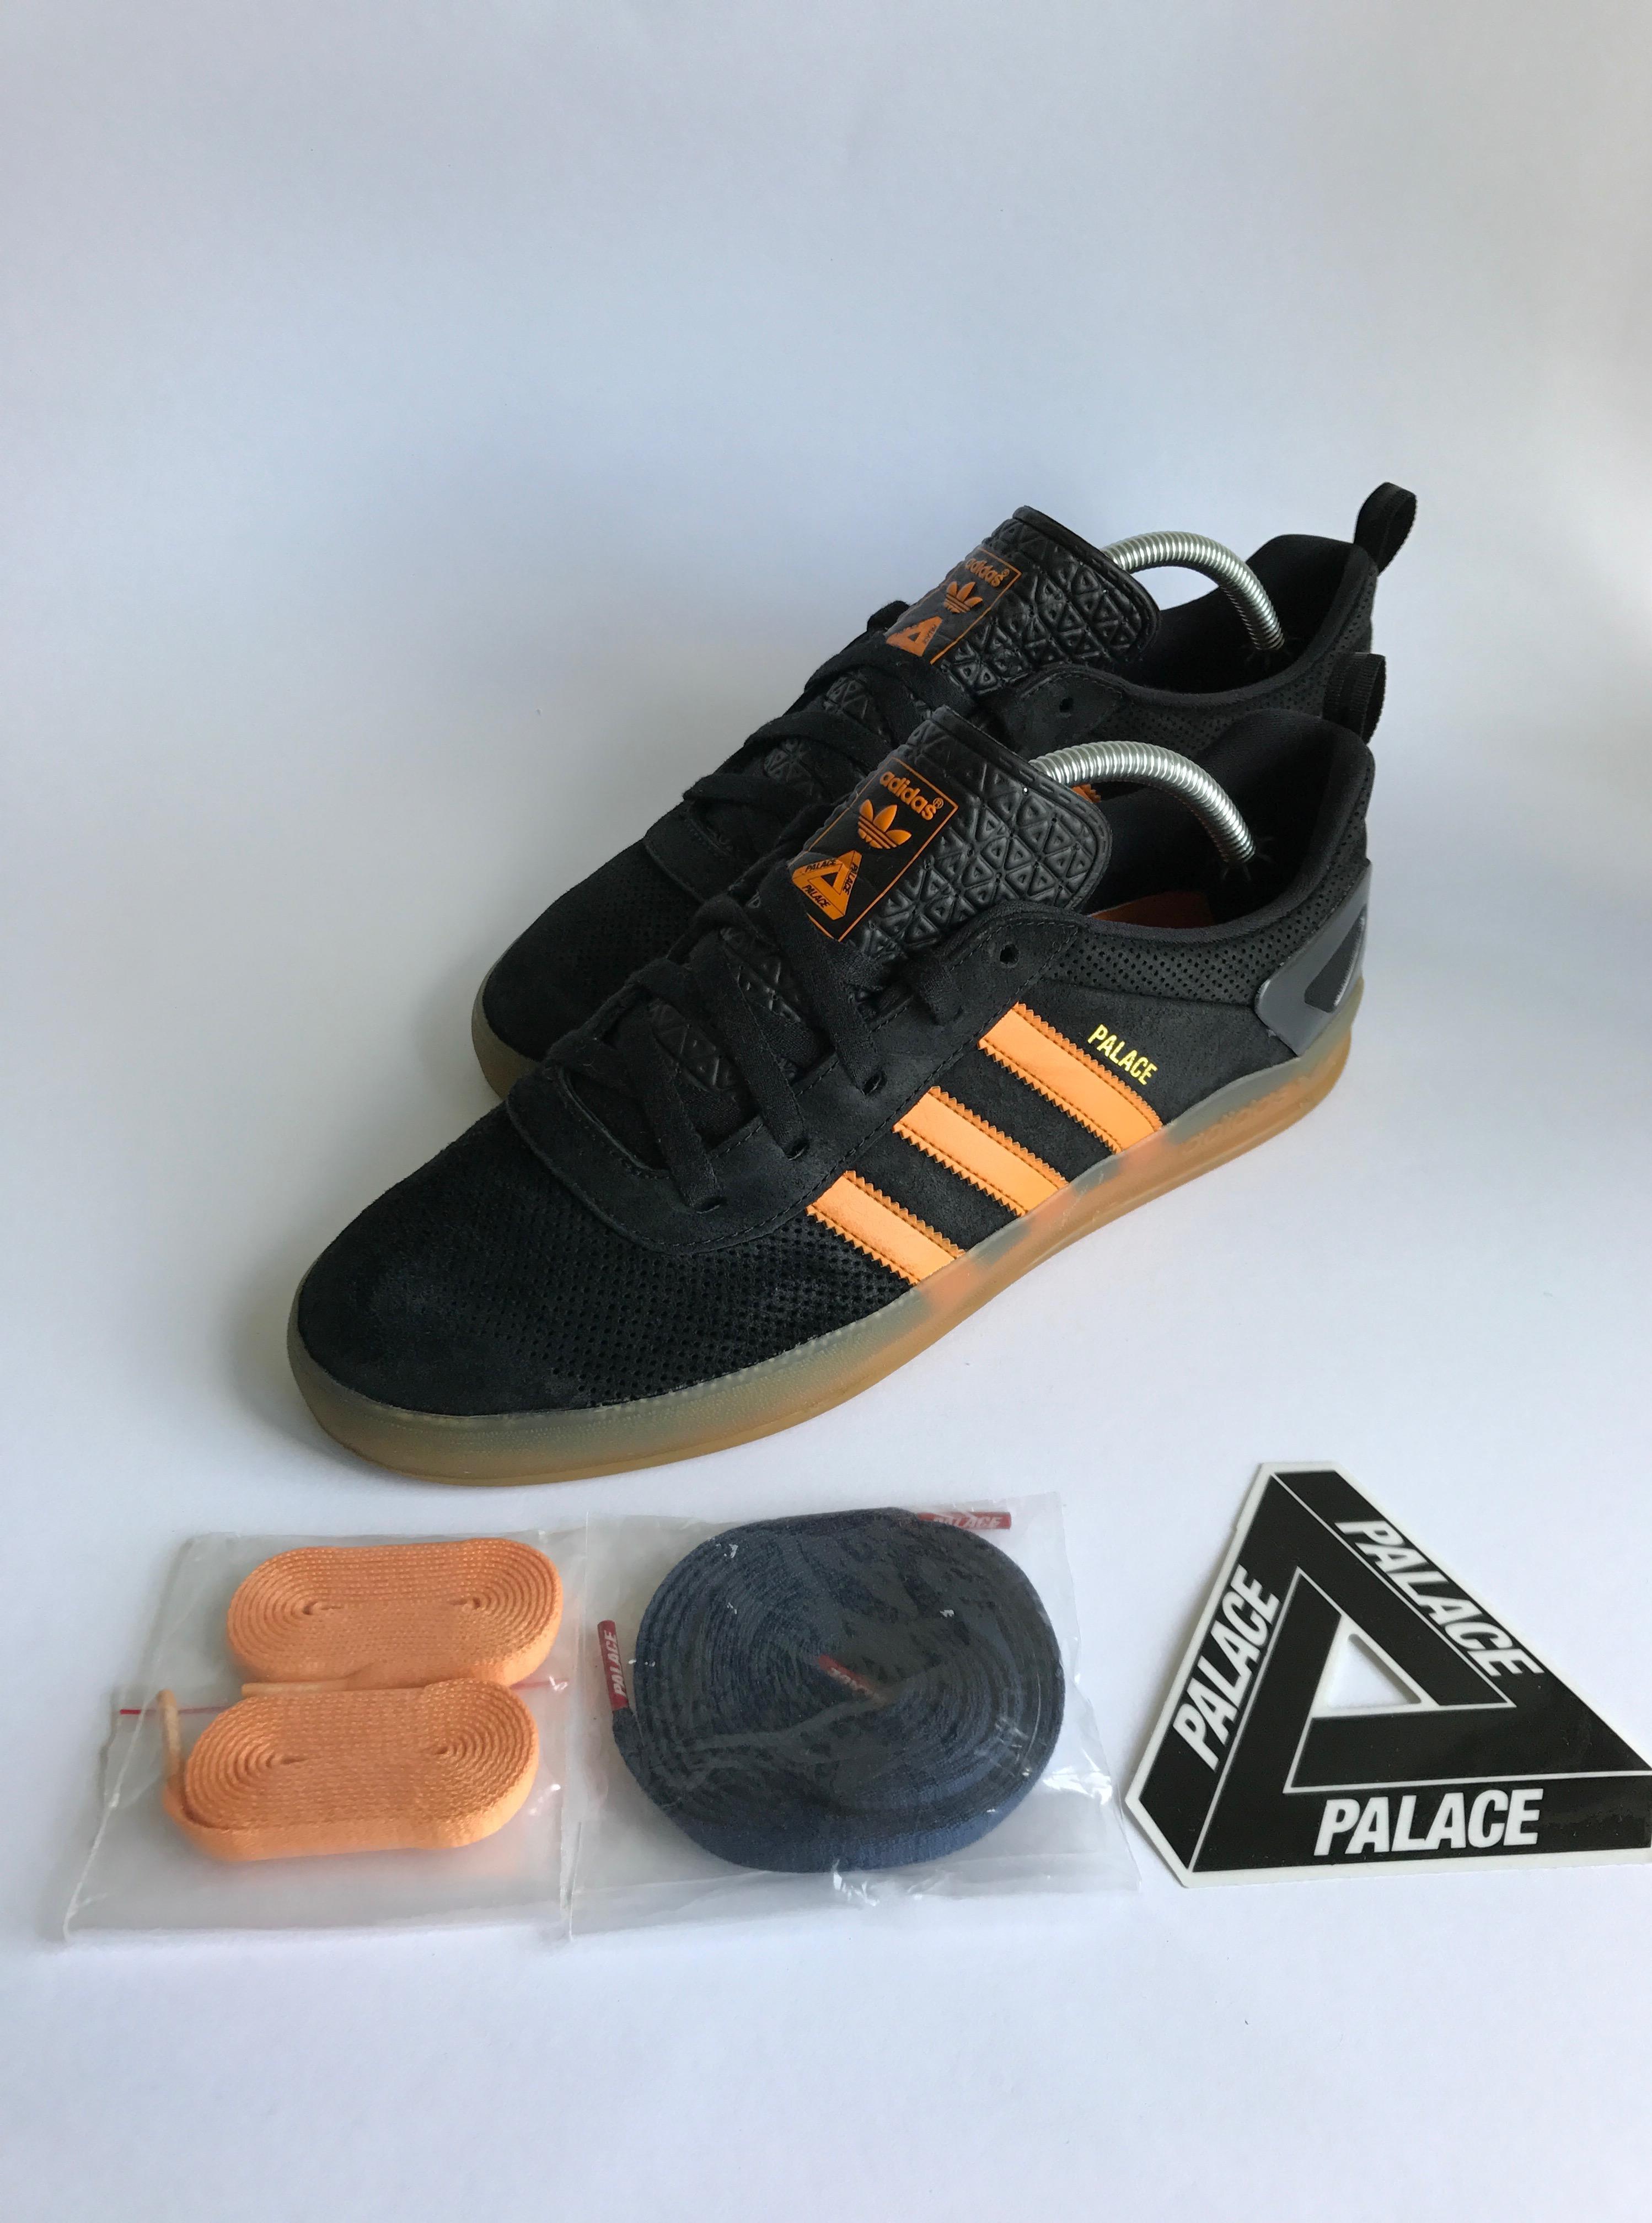 231c5425d7b Adidas Adidas x Palace Pro (Black Orange) Size 8.5 - Low-Top ...